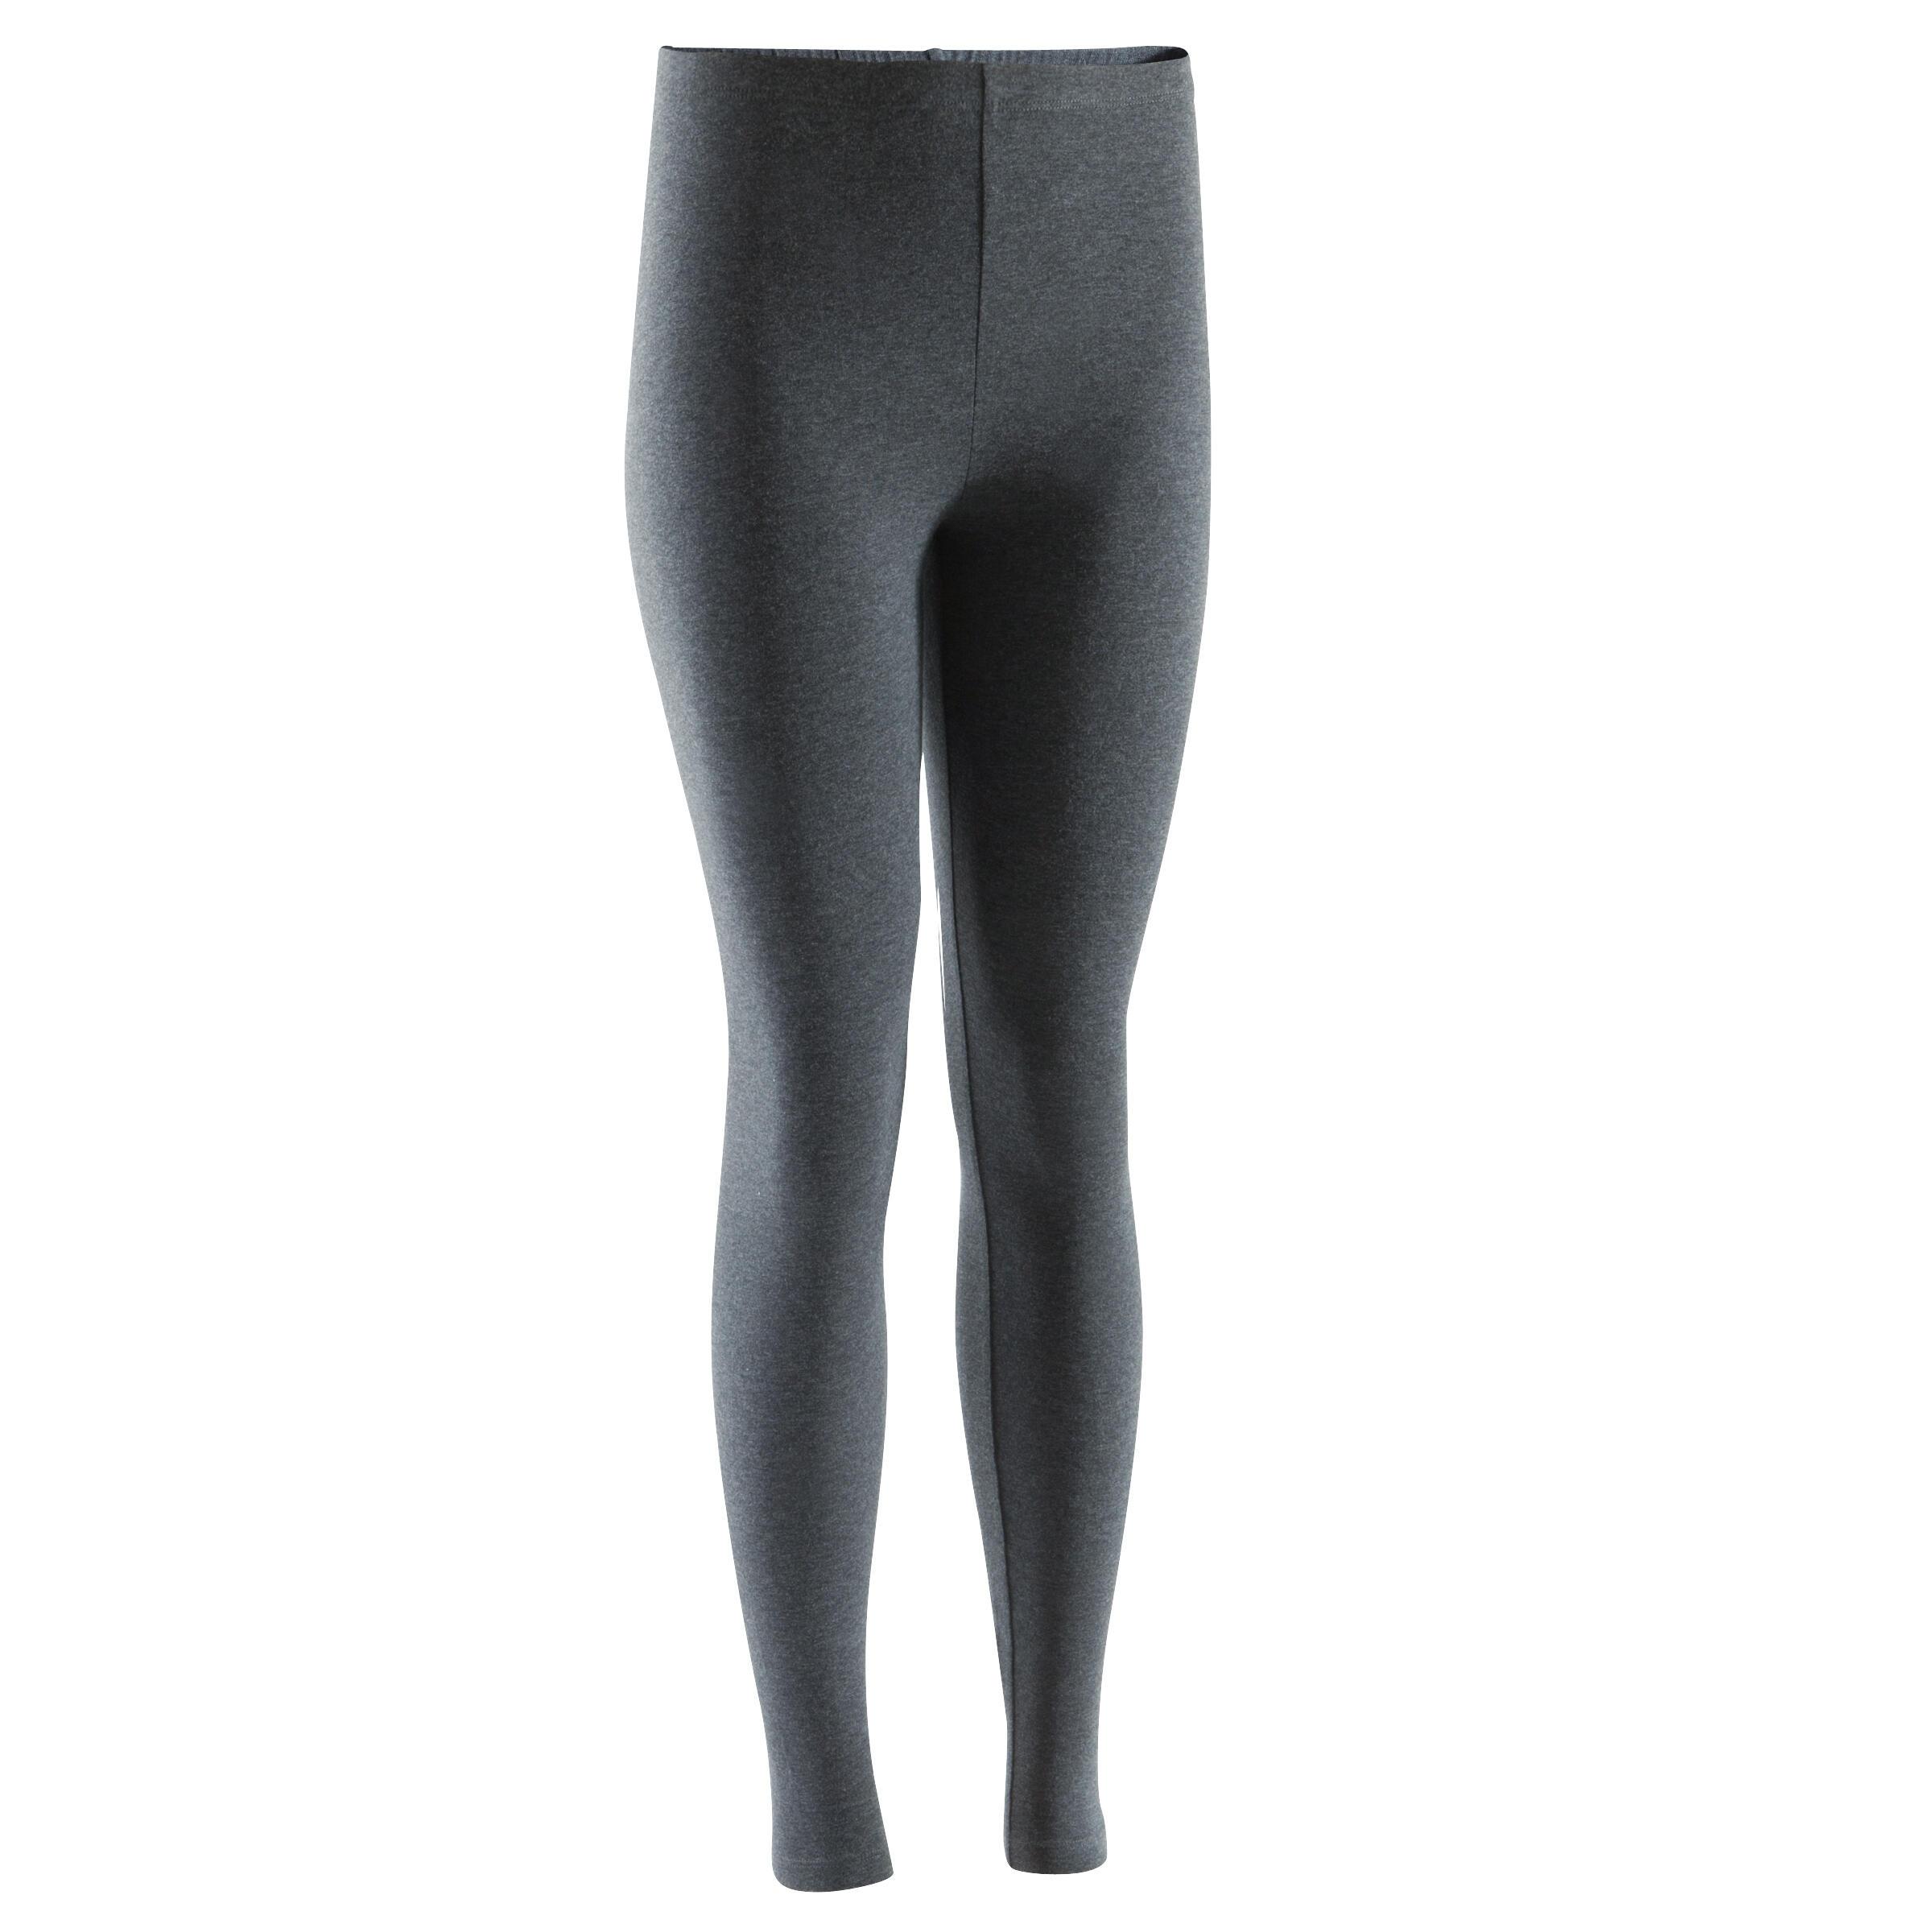 Leggings 100 slim gimnasia y pilates mujer gris oscuro Salto